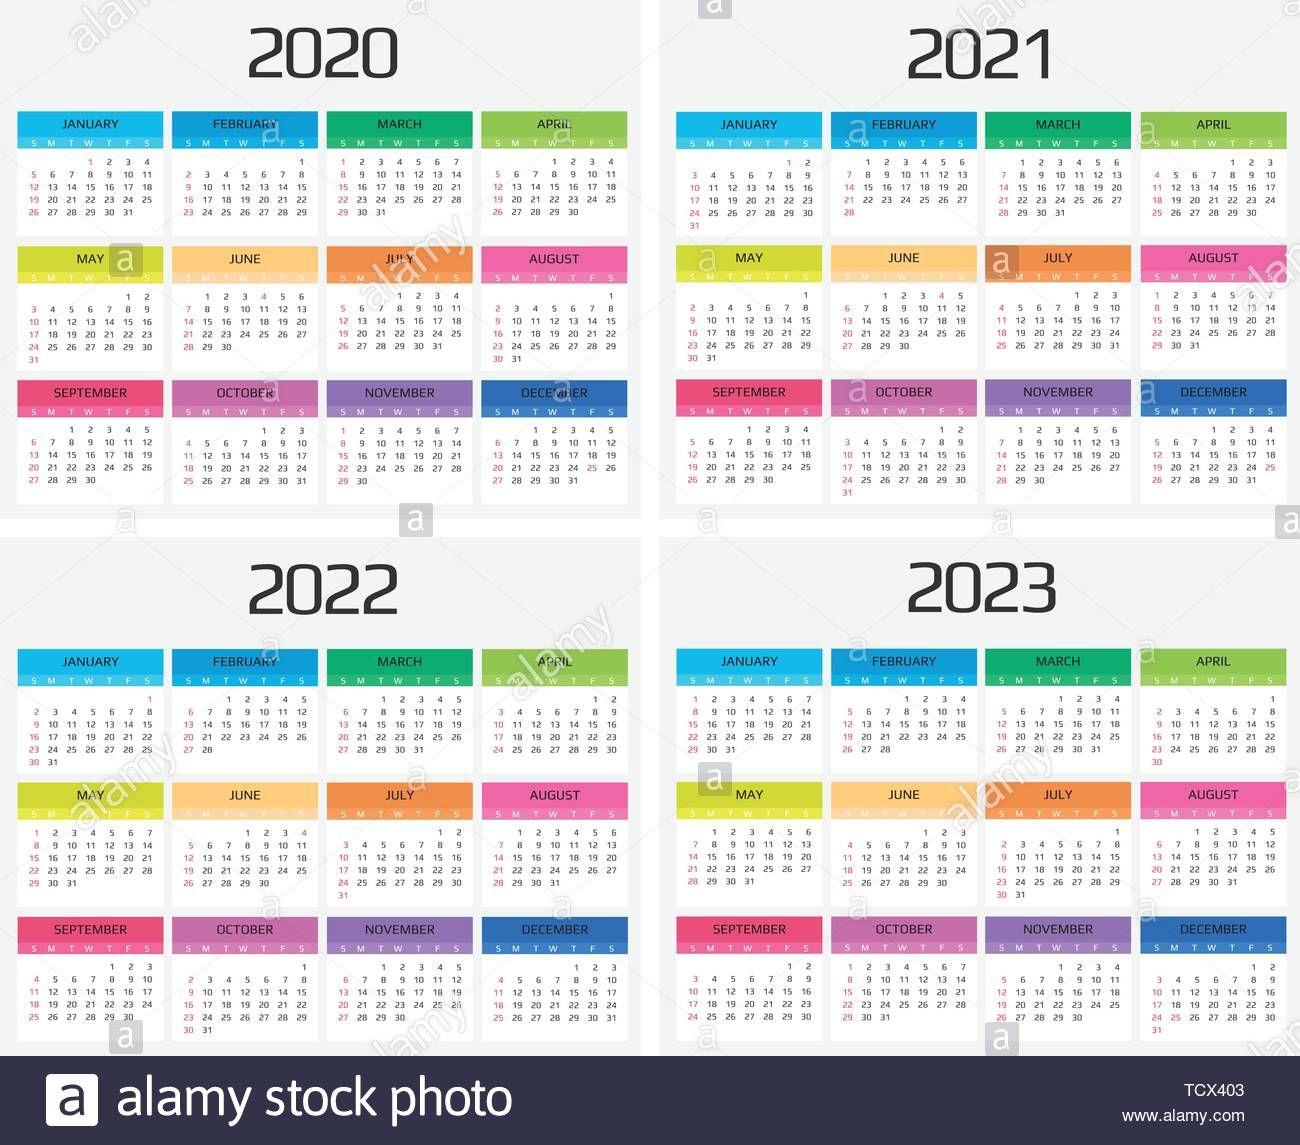 20+ 2020 2021 2022 Calendar - Free Download Printable